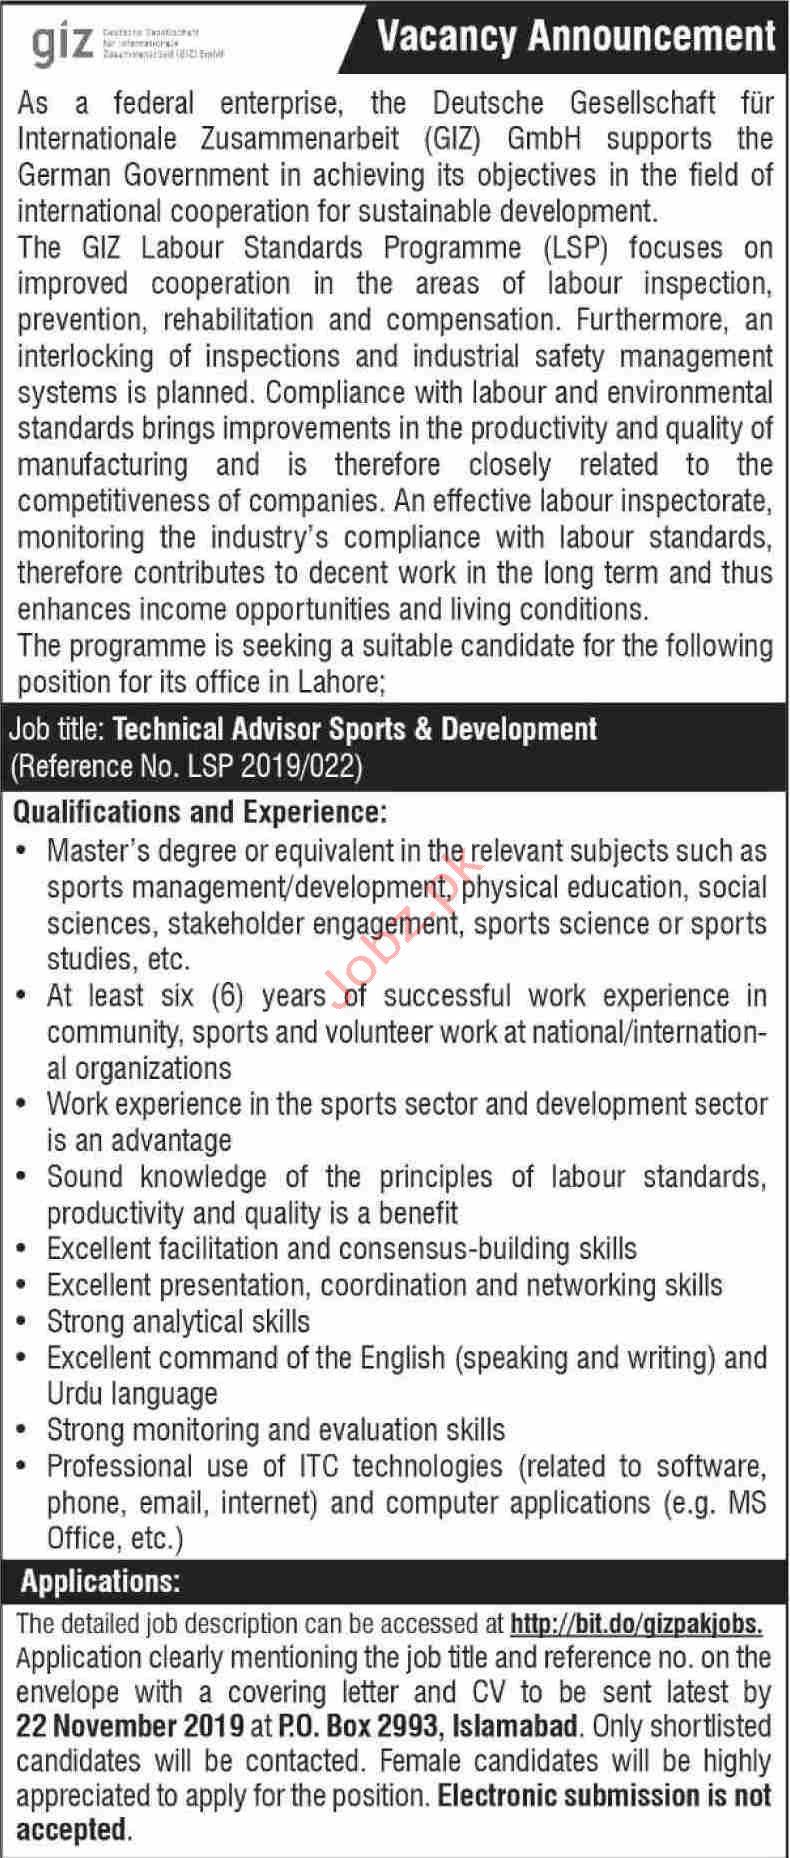 GIZ Pakistan Technical Advisor Jobs in Islamabad